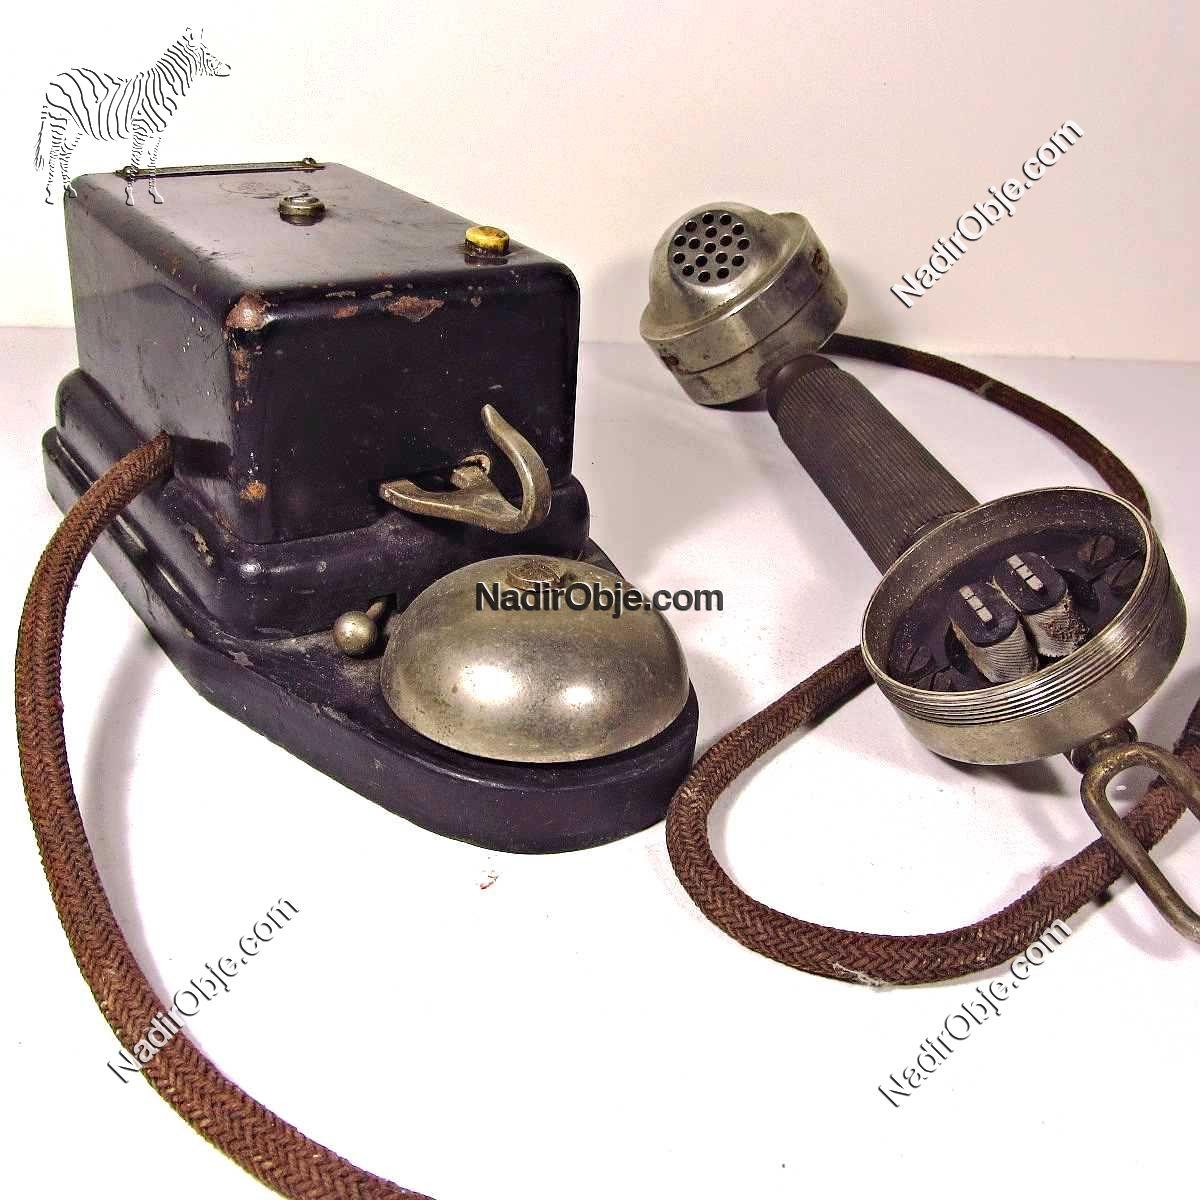 n1287-cok-eski-telefon-makinasi-nadir-obje-5